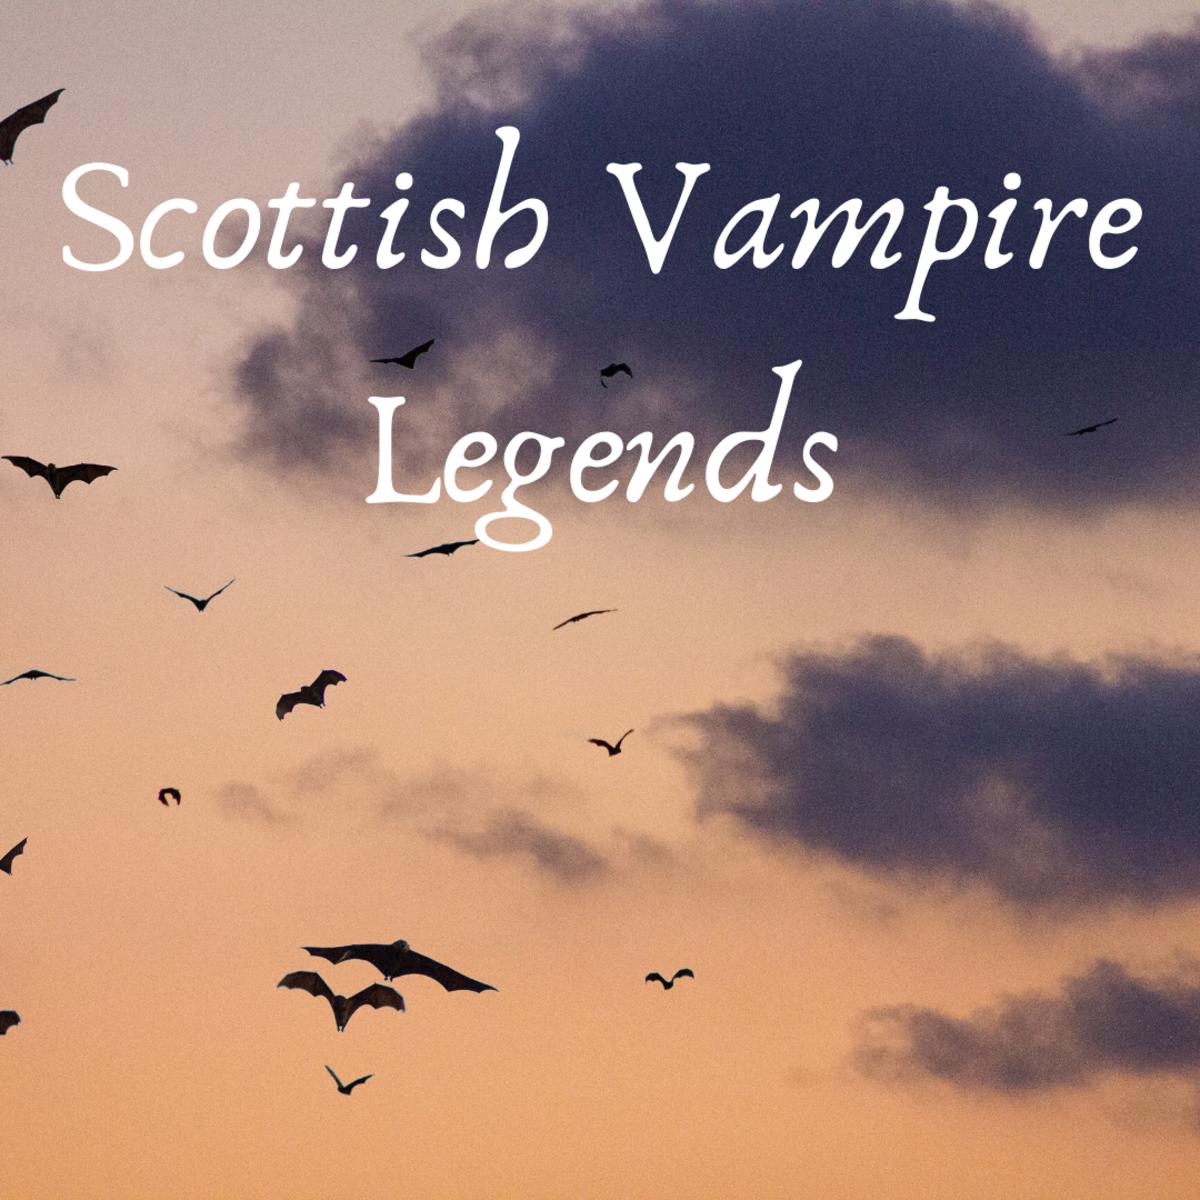 Scottish Vampire Legends